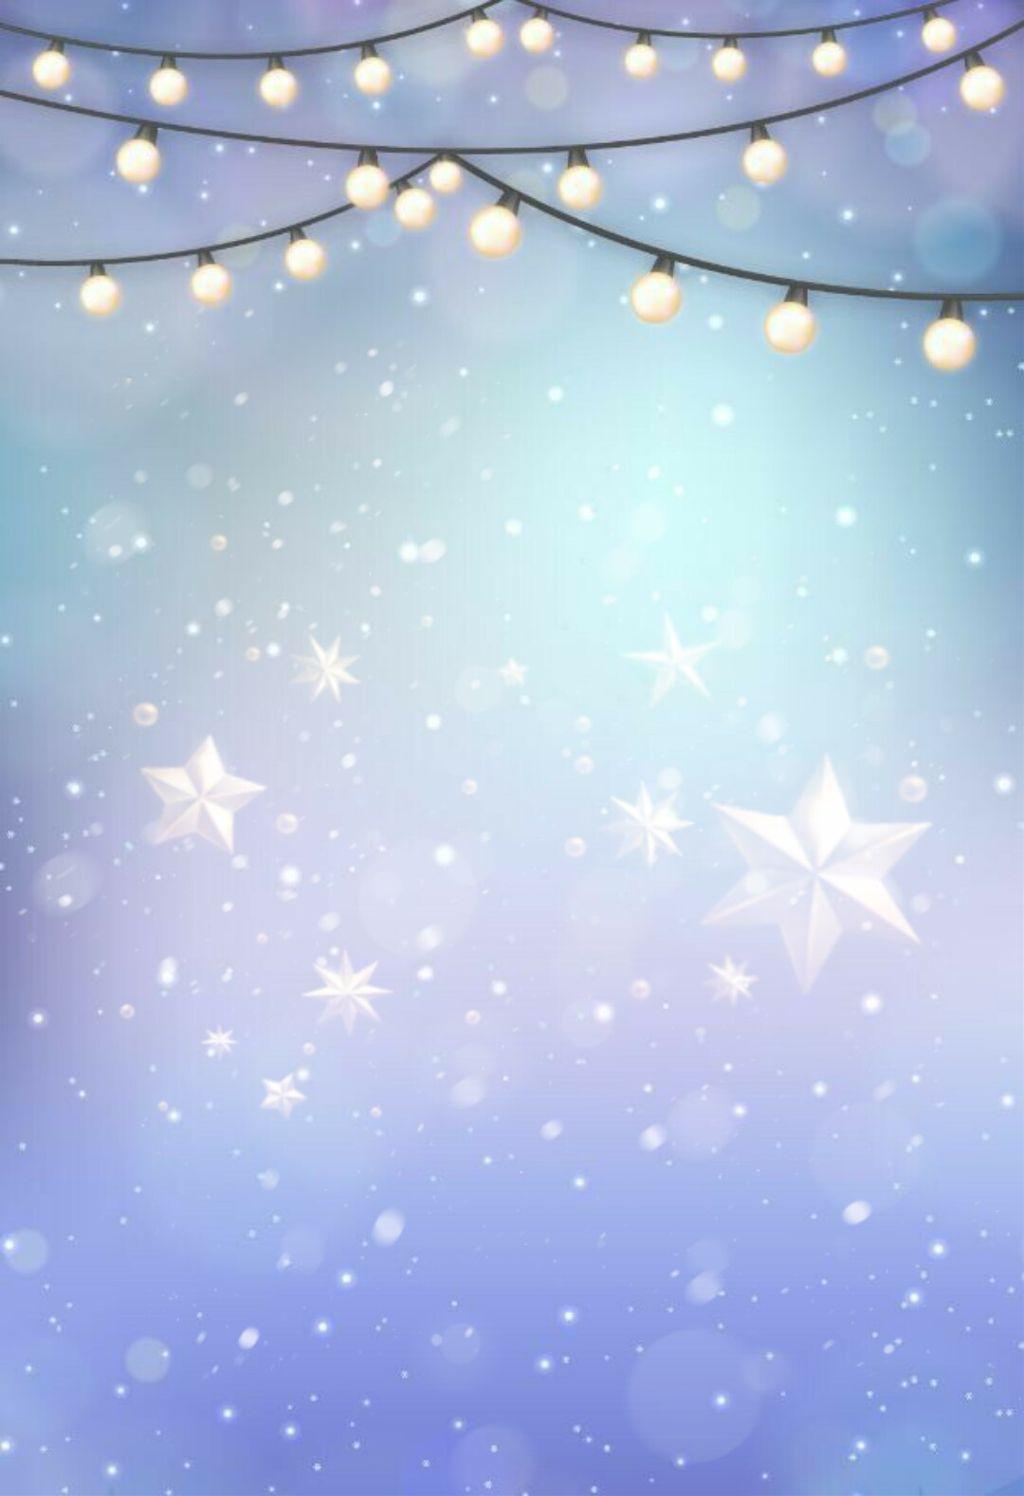 Christmas Background Picsart.Freetoedit Background Christmas Image By Momo